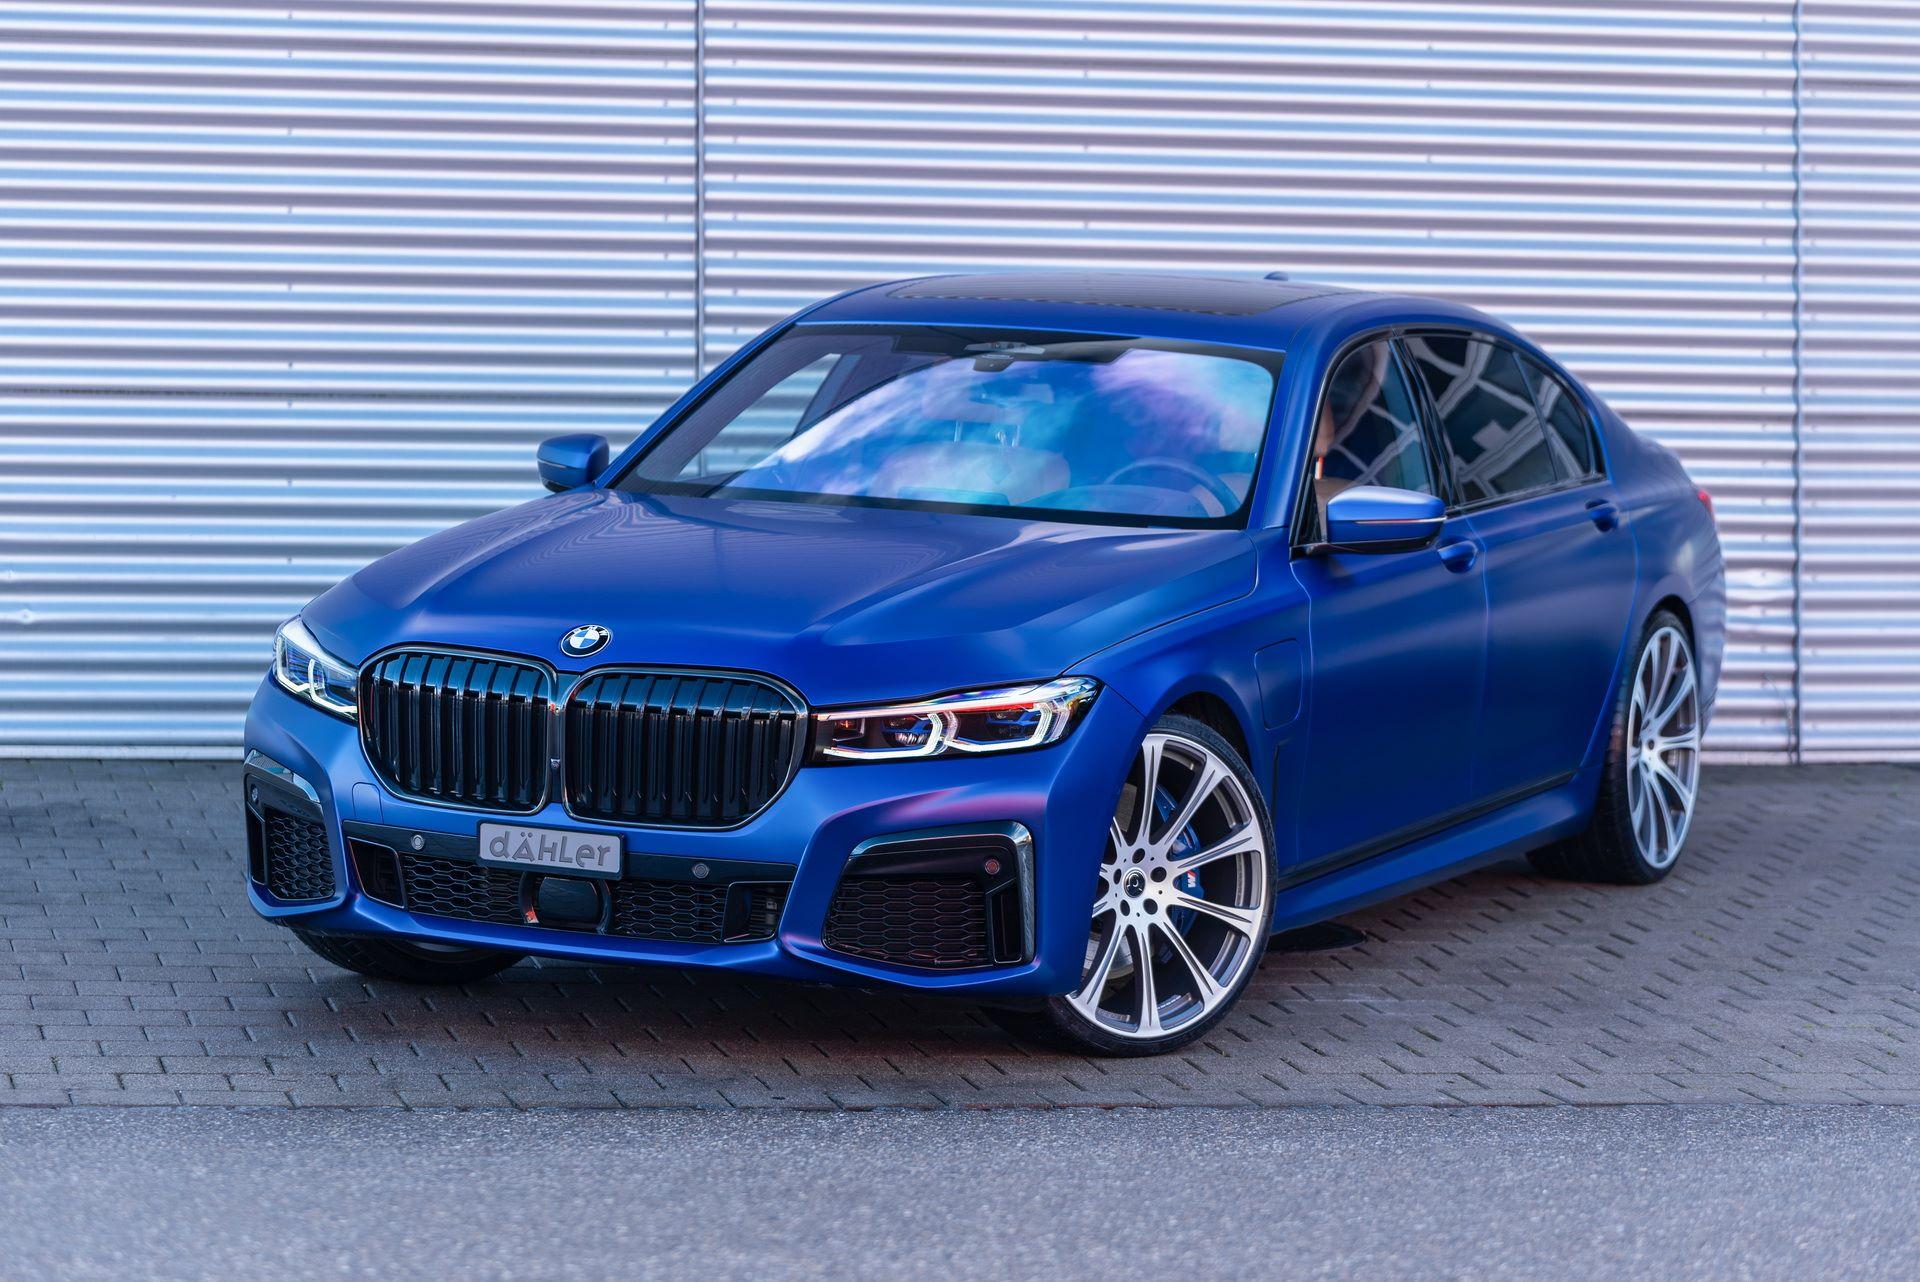 BMW-745Le-xDrive-by-Dahler-1